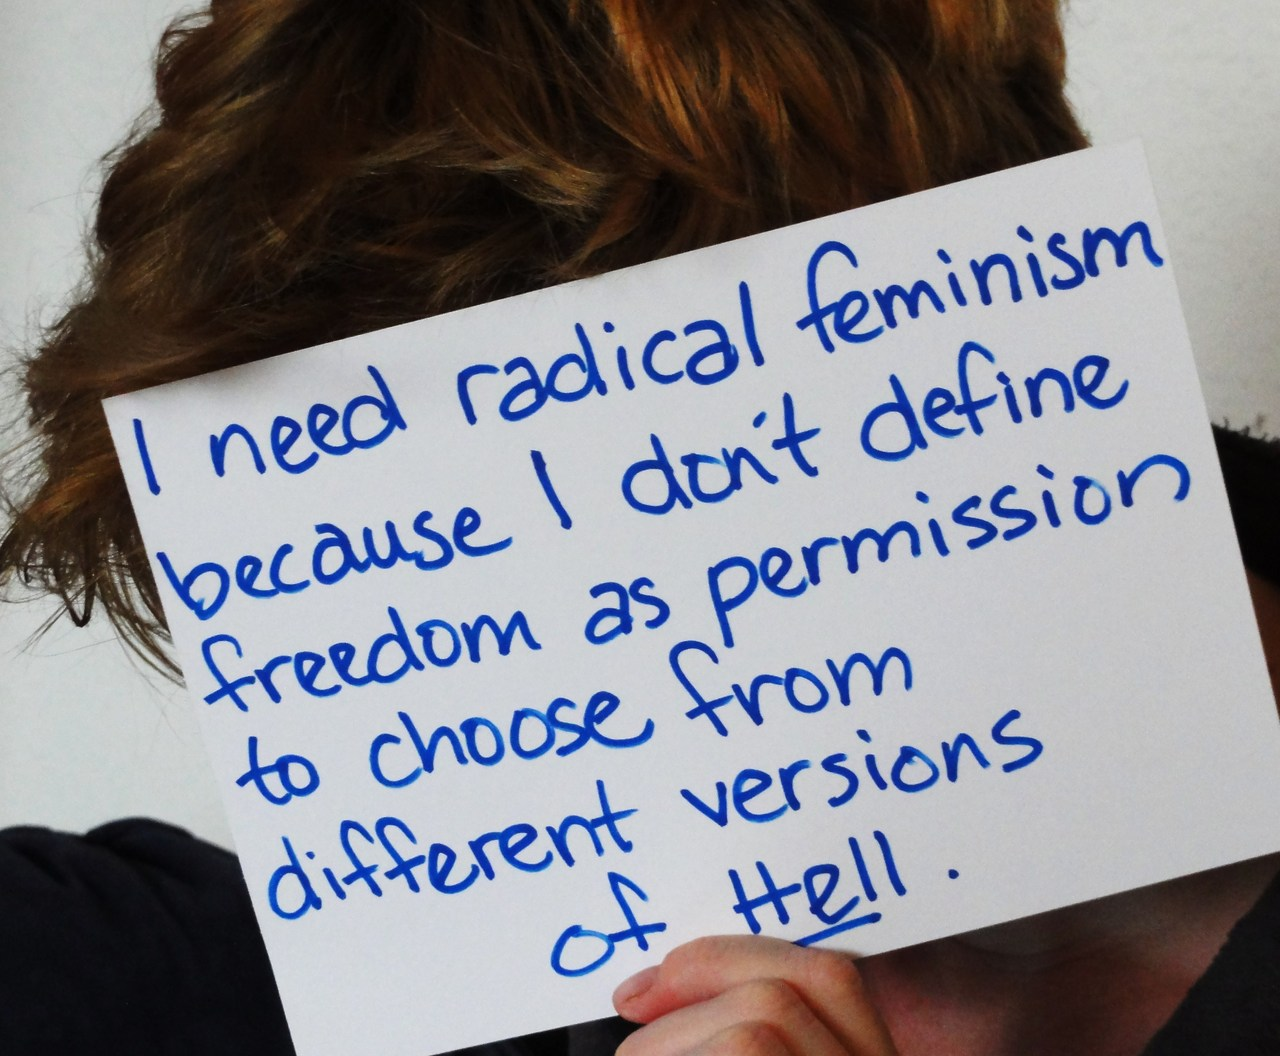 igor primoratz and radical feminists sexuality essay